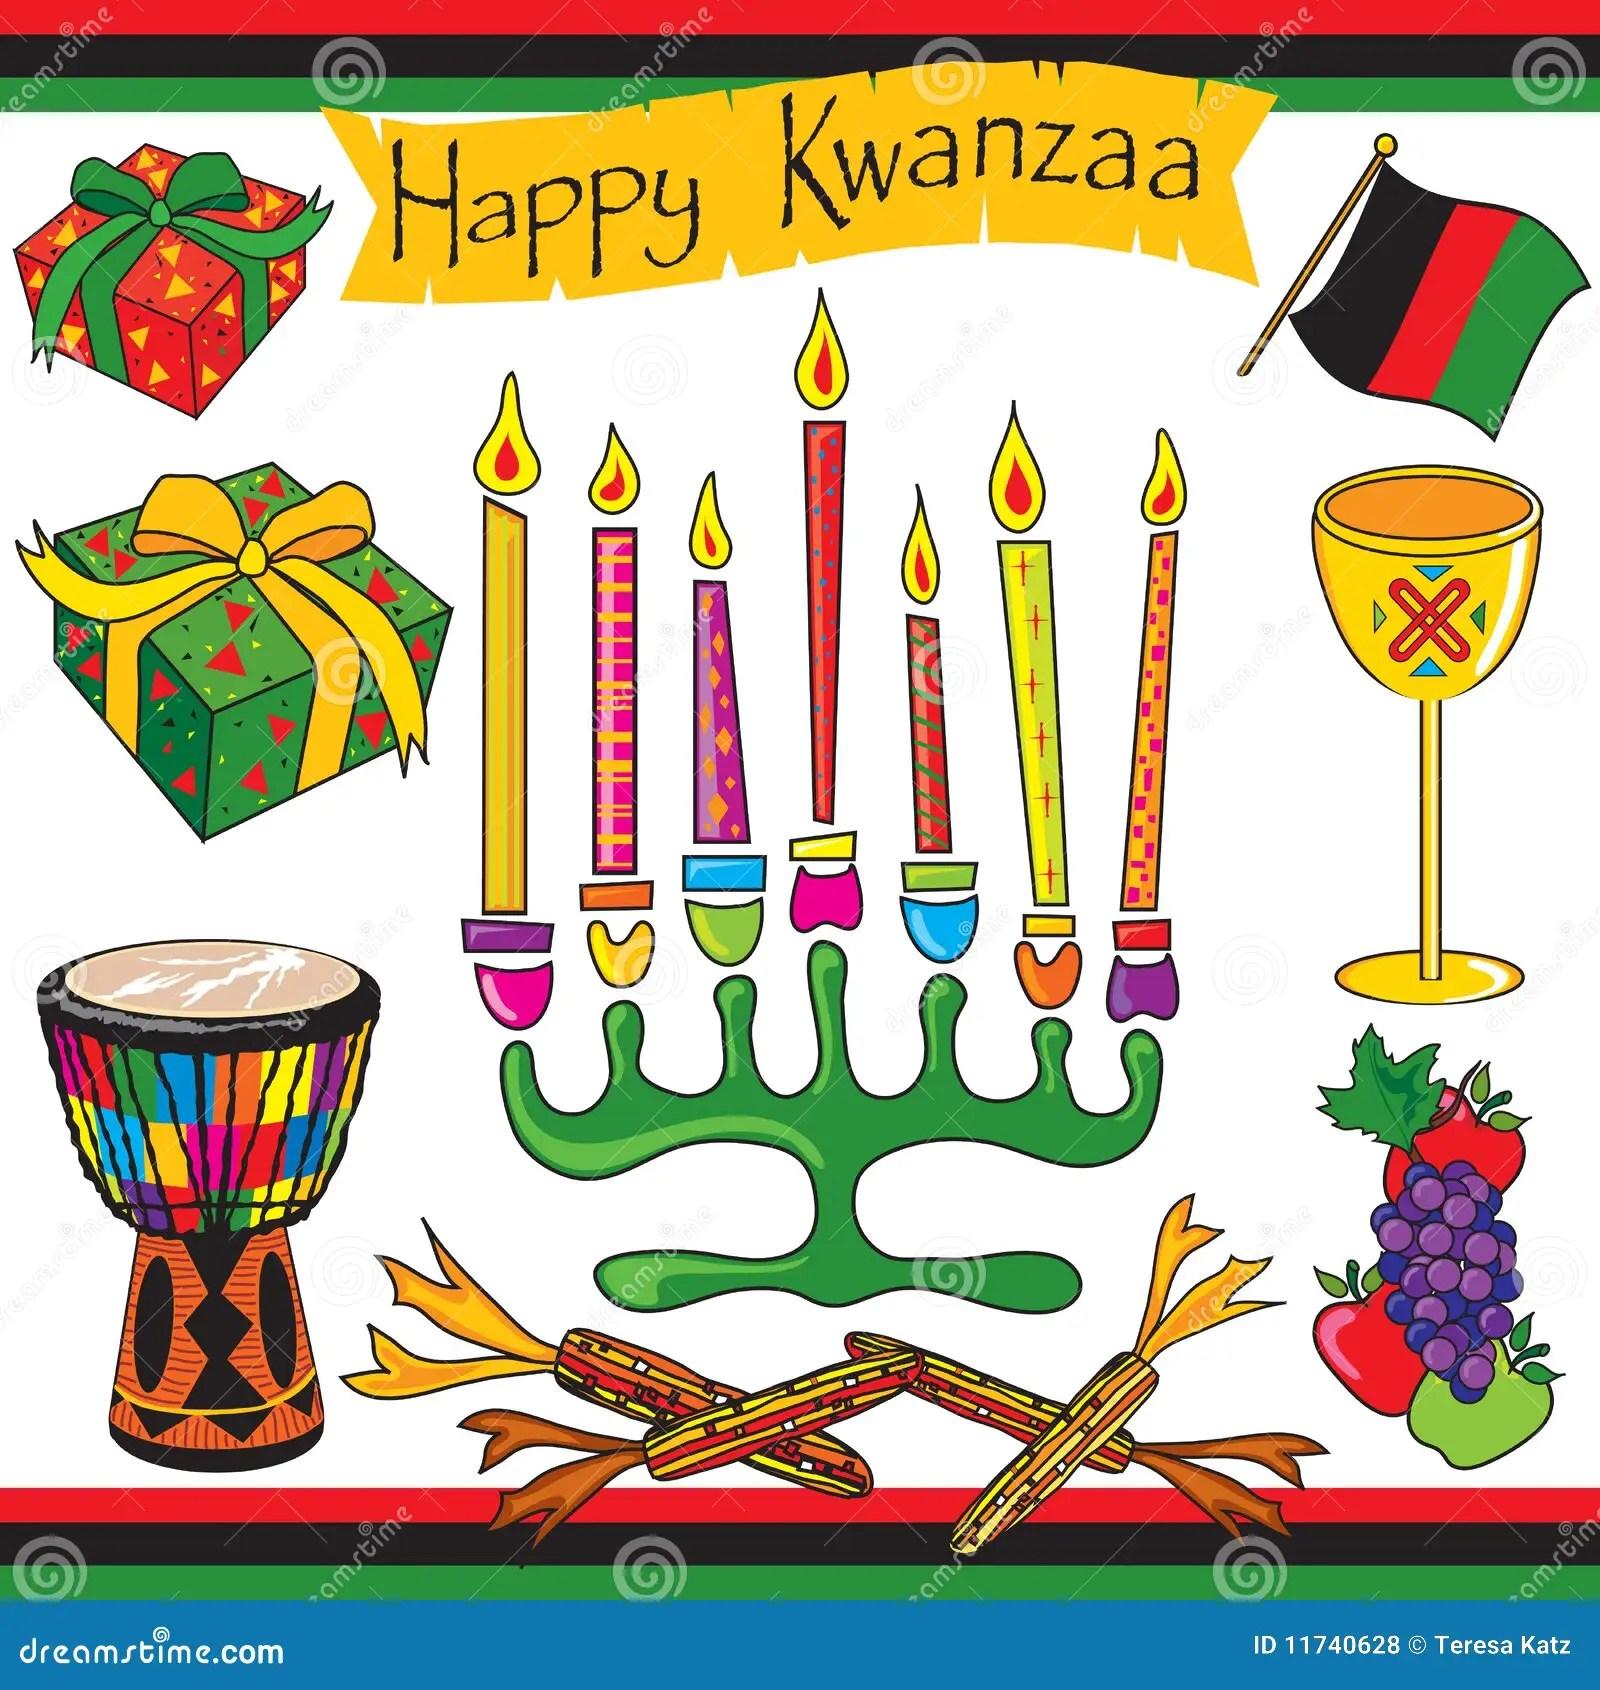 Happy Kwanzaa Clip Art And Icons Stock Vector